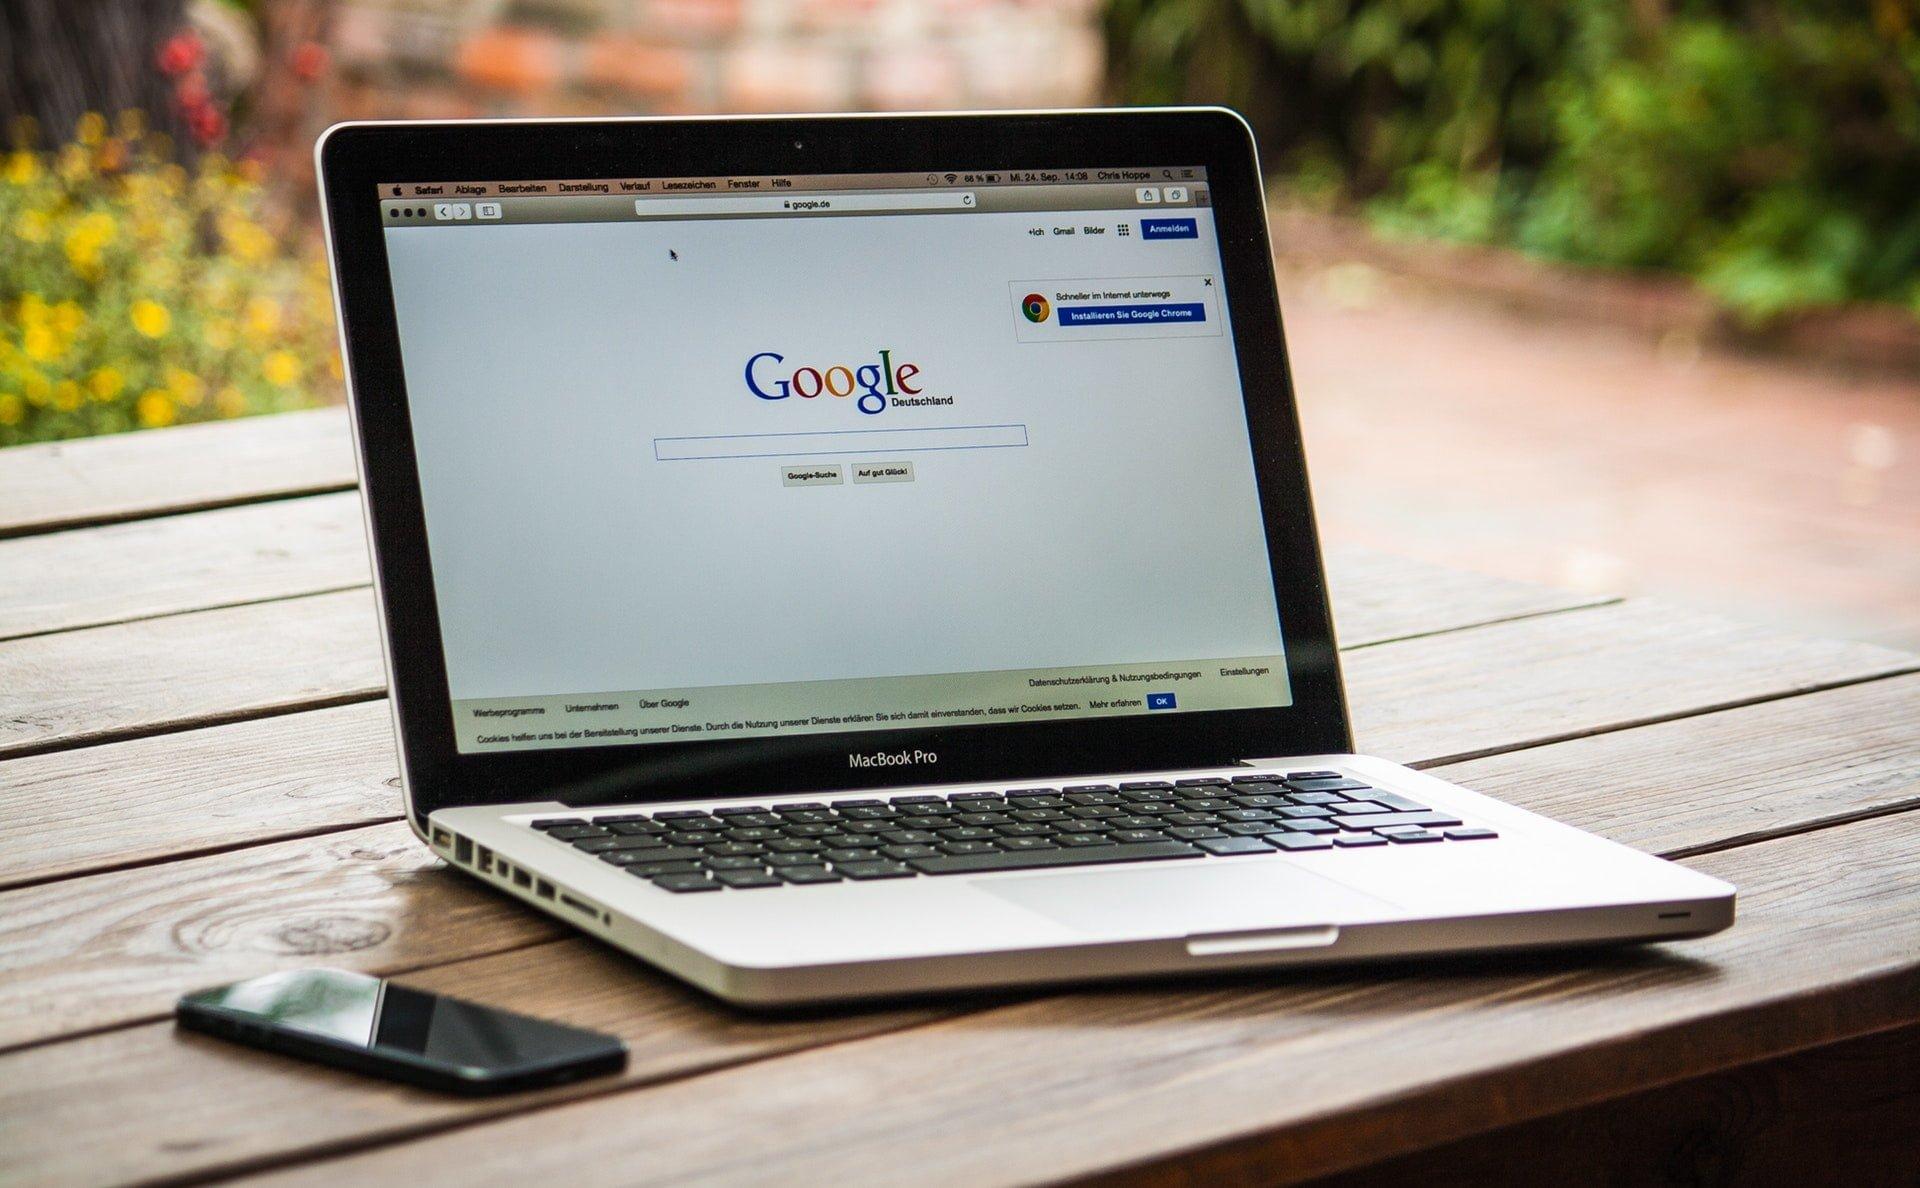 google search engine on macbook pro 戰鬥民族 俄羅斯人愛用的網路搜尋引擎是哪一家?